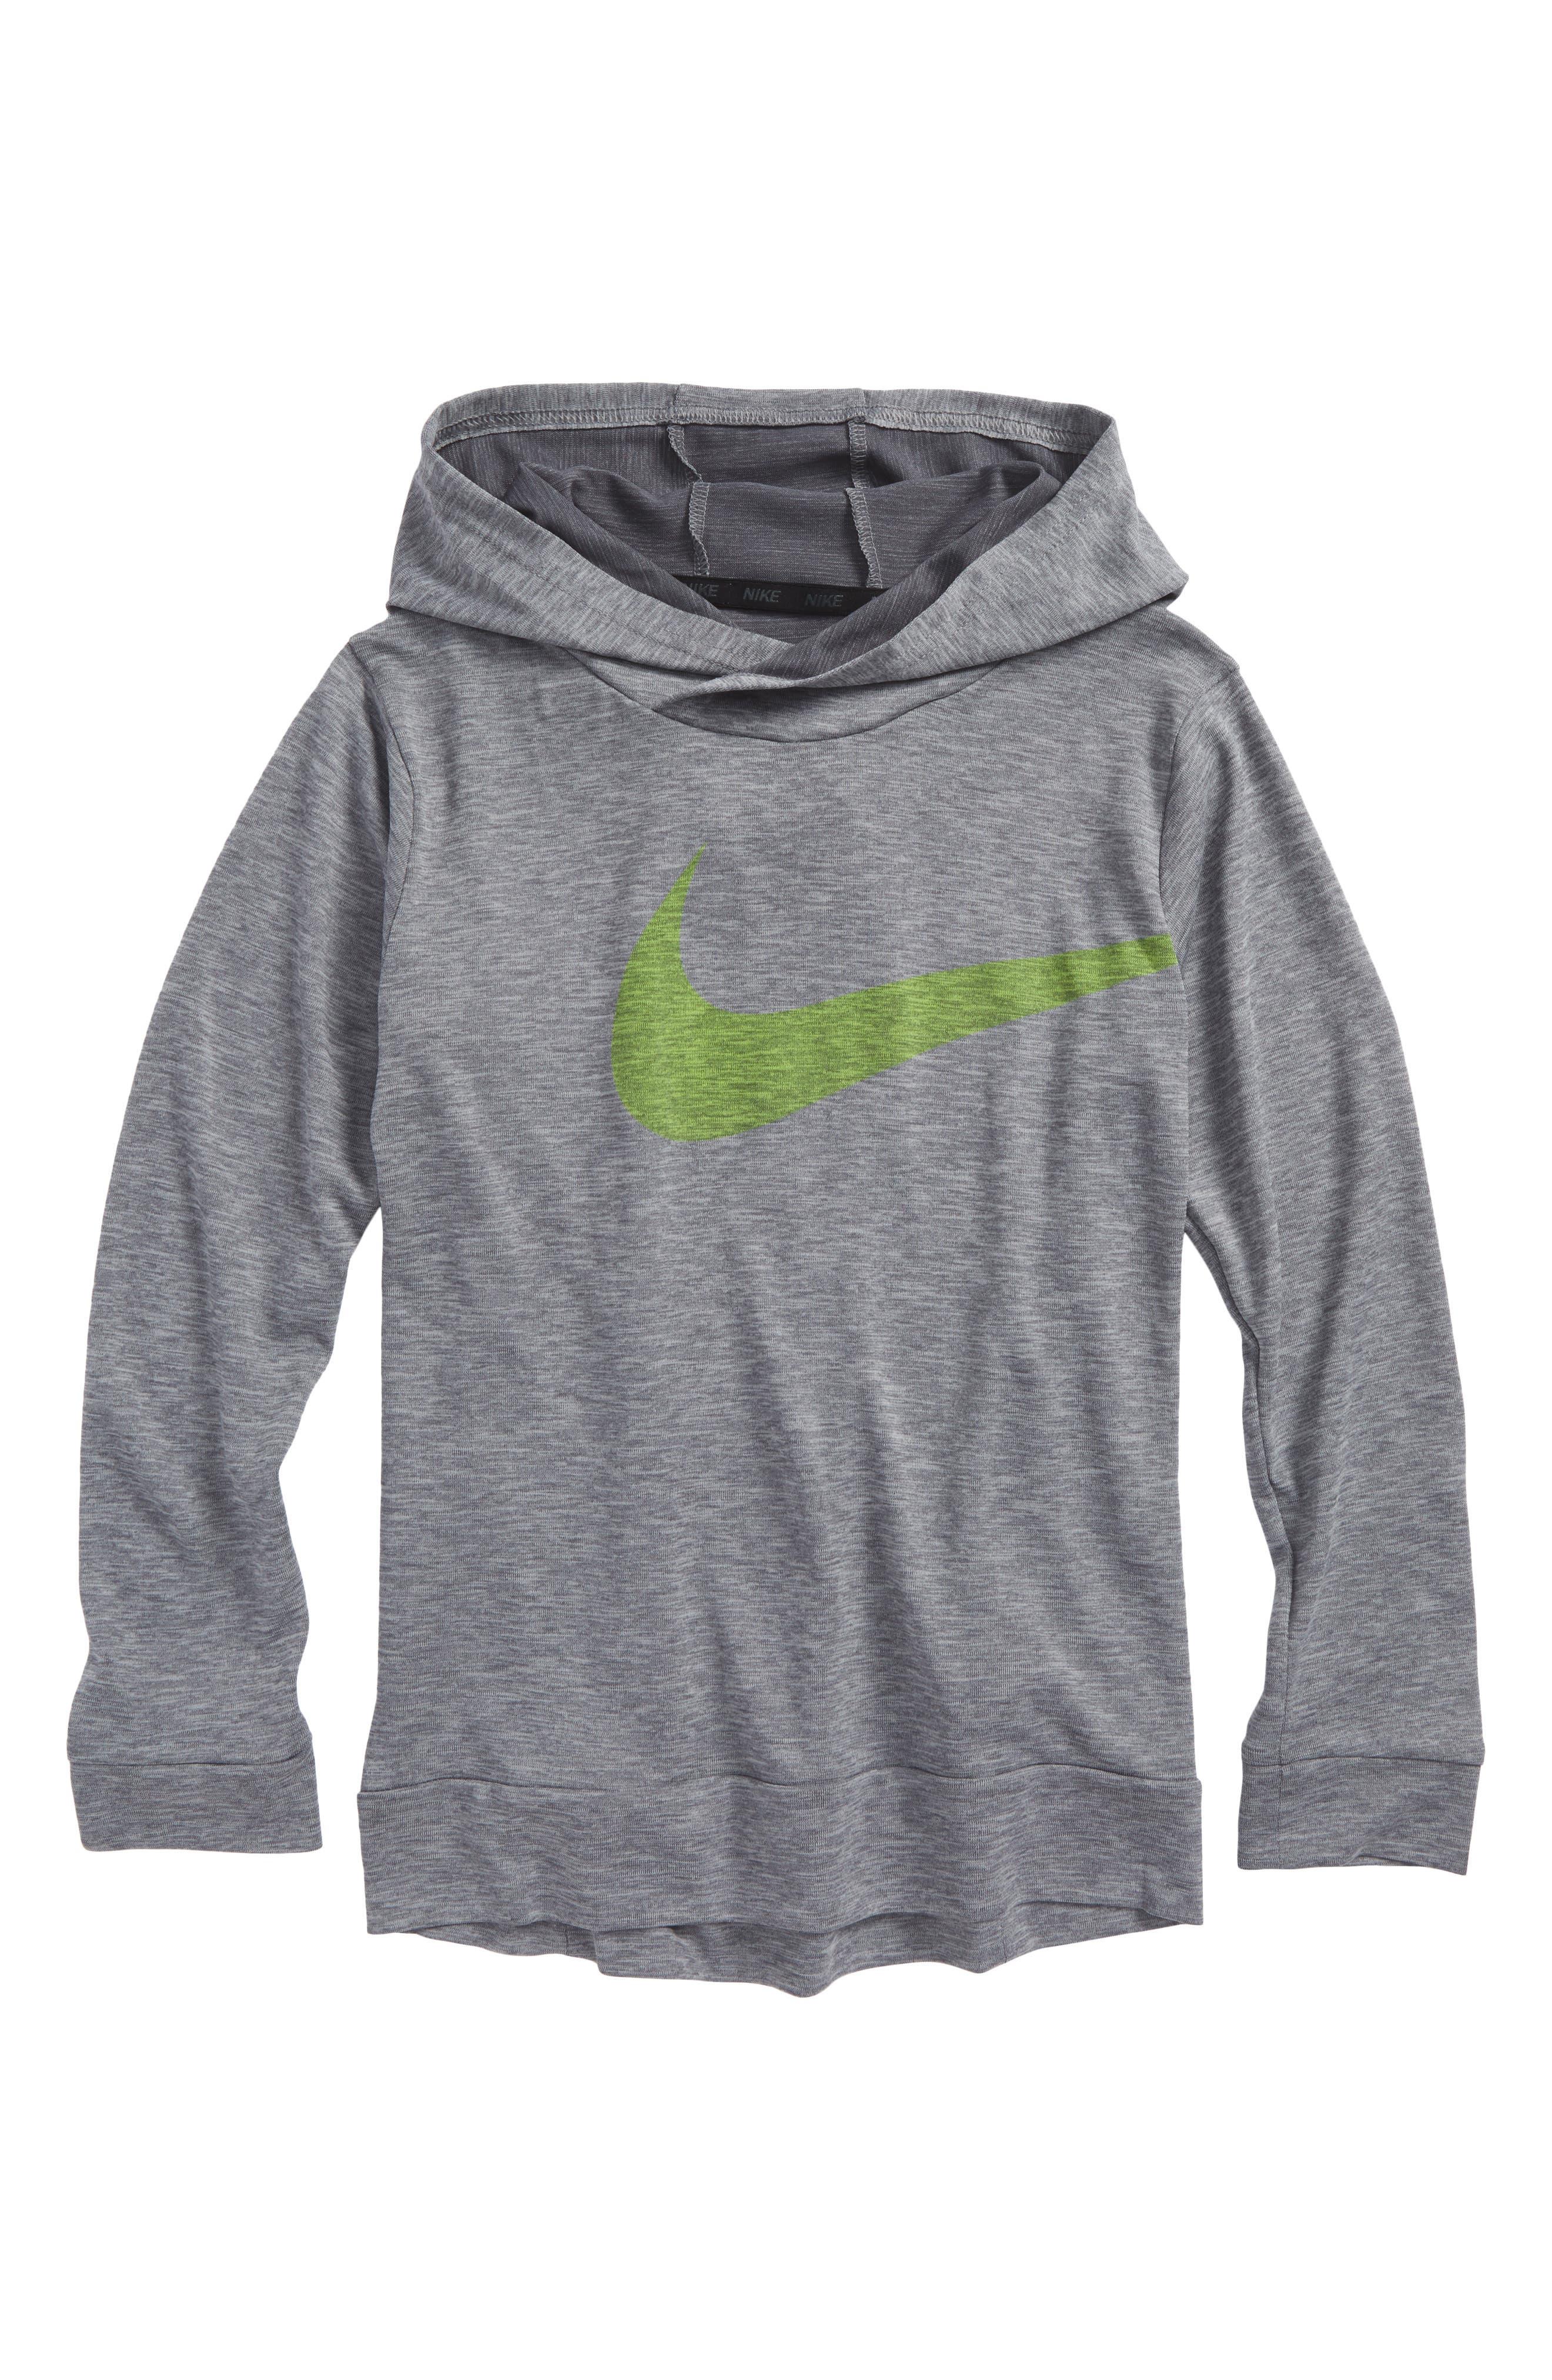 Alternate Image 1 Selected - Nike Breathe Training Hoodie (Little Boys & Big Boys)